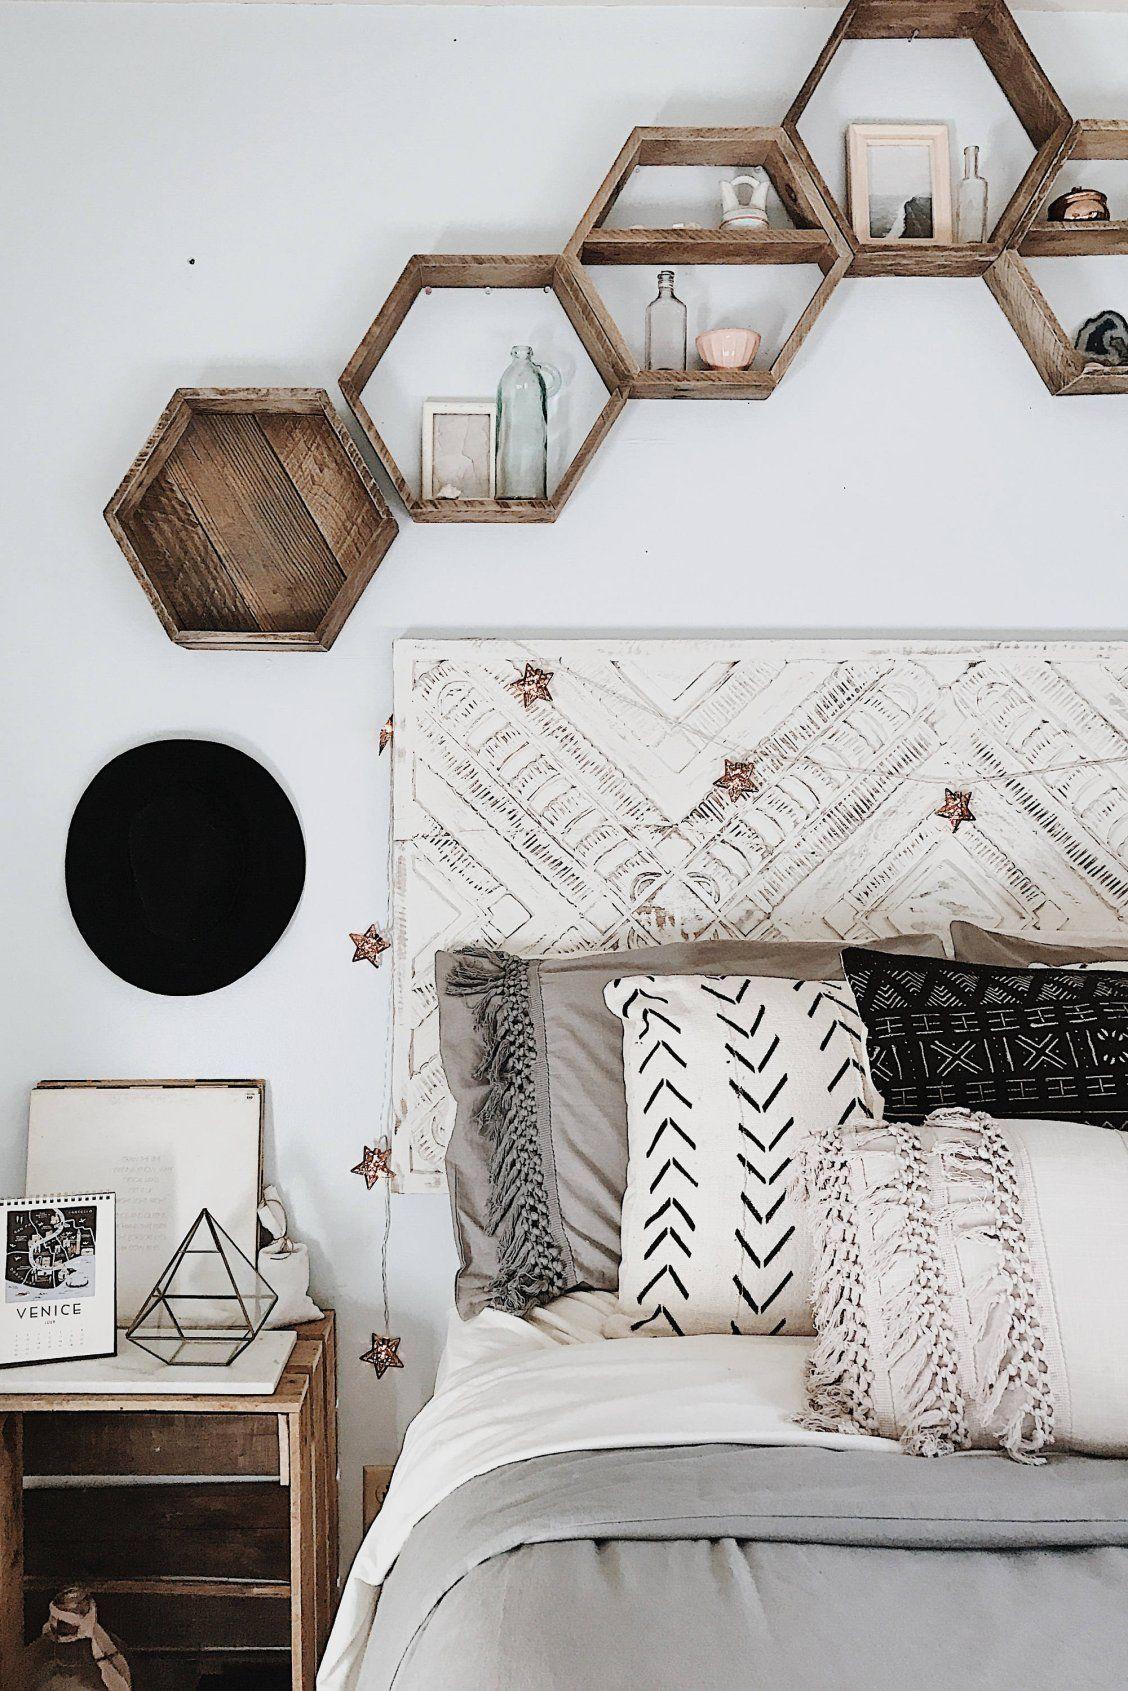 35 Wonderful DIY Home Decor Ideas